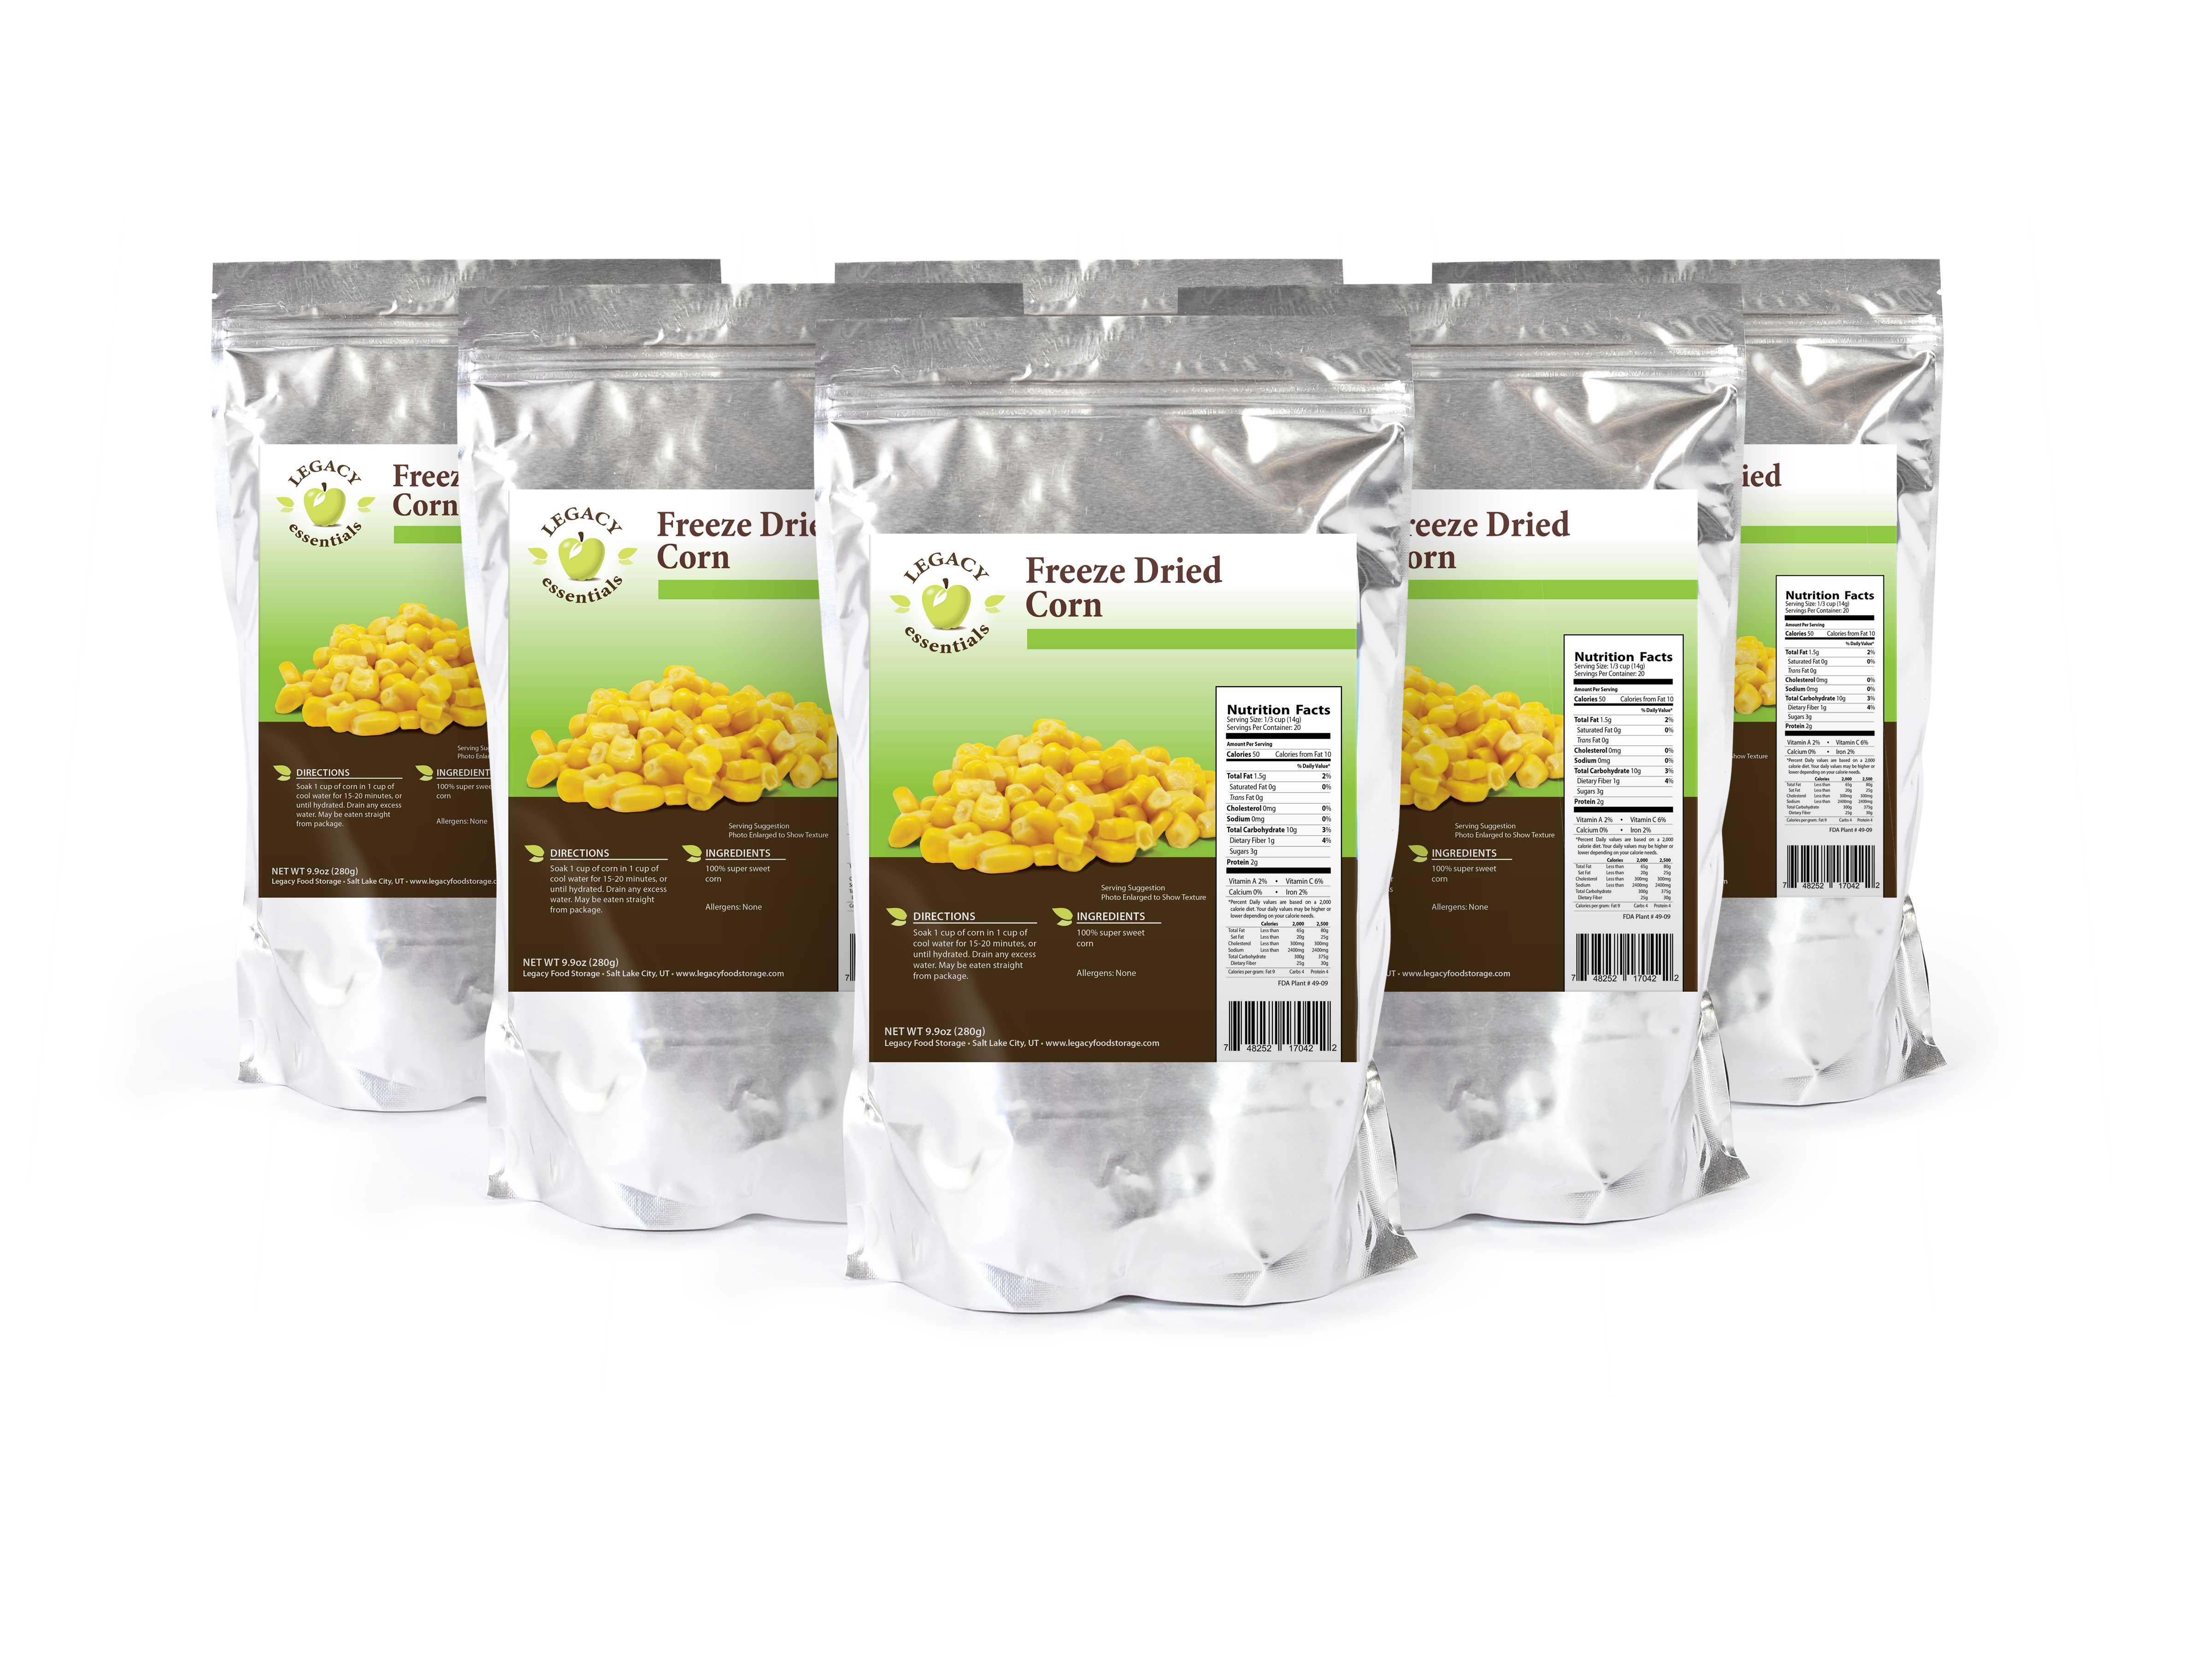 20 Servings Freeze-Dried Corn Pouch u2013 6 pack  sc 1 st  Outback Survival Supplies & 20 Servings Freeze-Dried Corn Pouch - 6 pack - Outback Survival Supplies